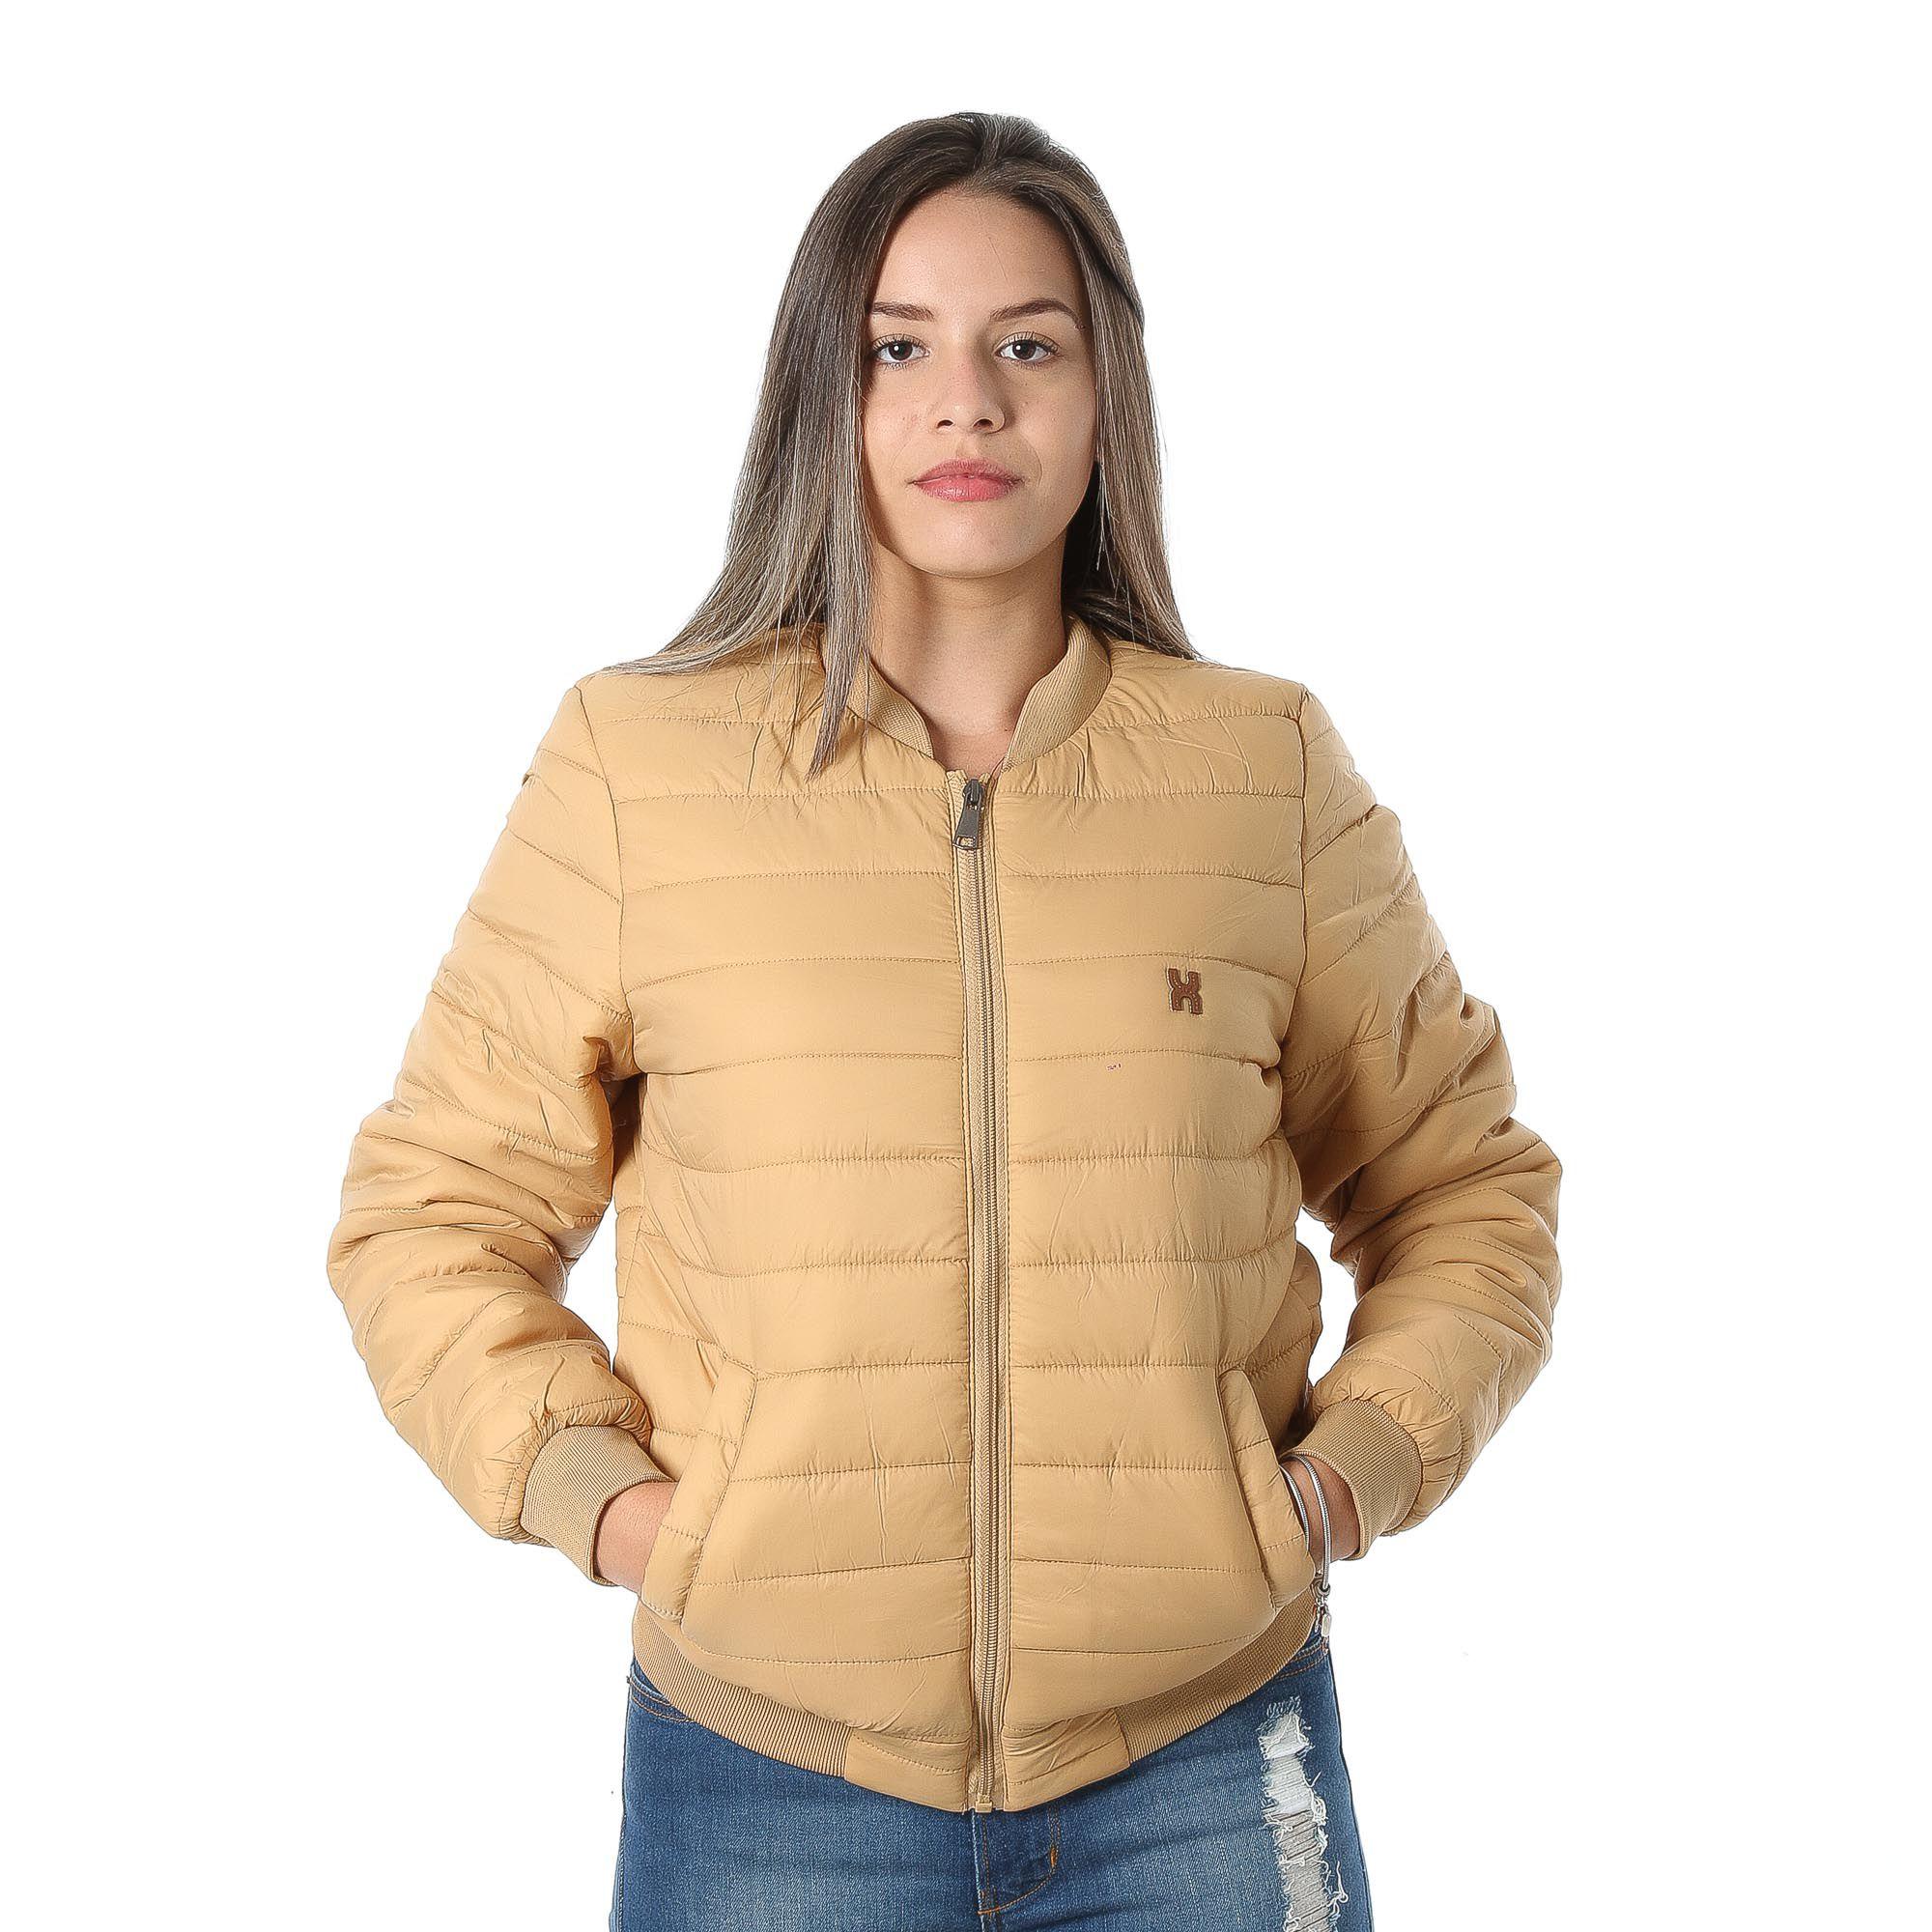 Jaqueta Puffer Feminina TXC 7056